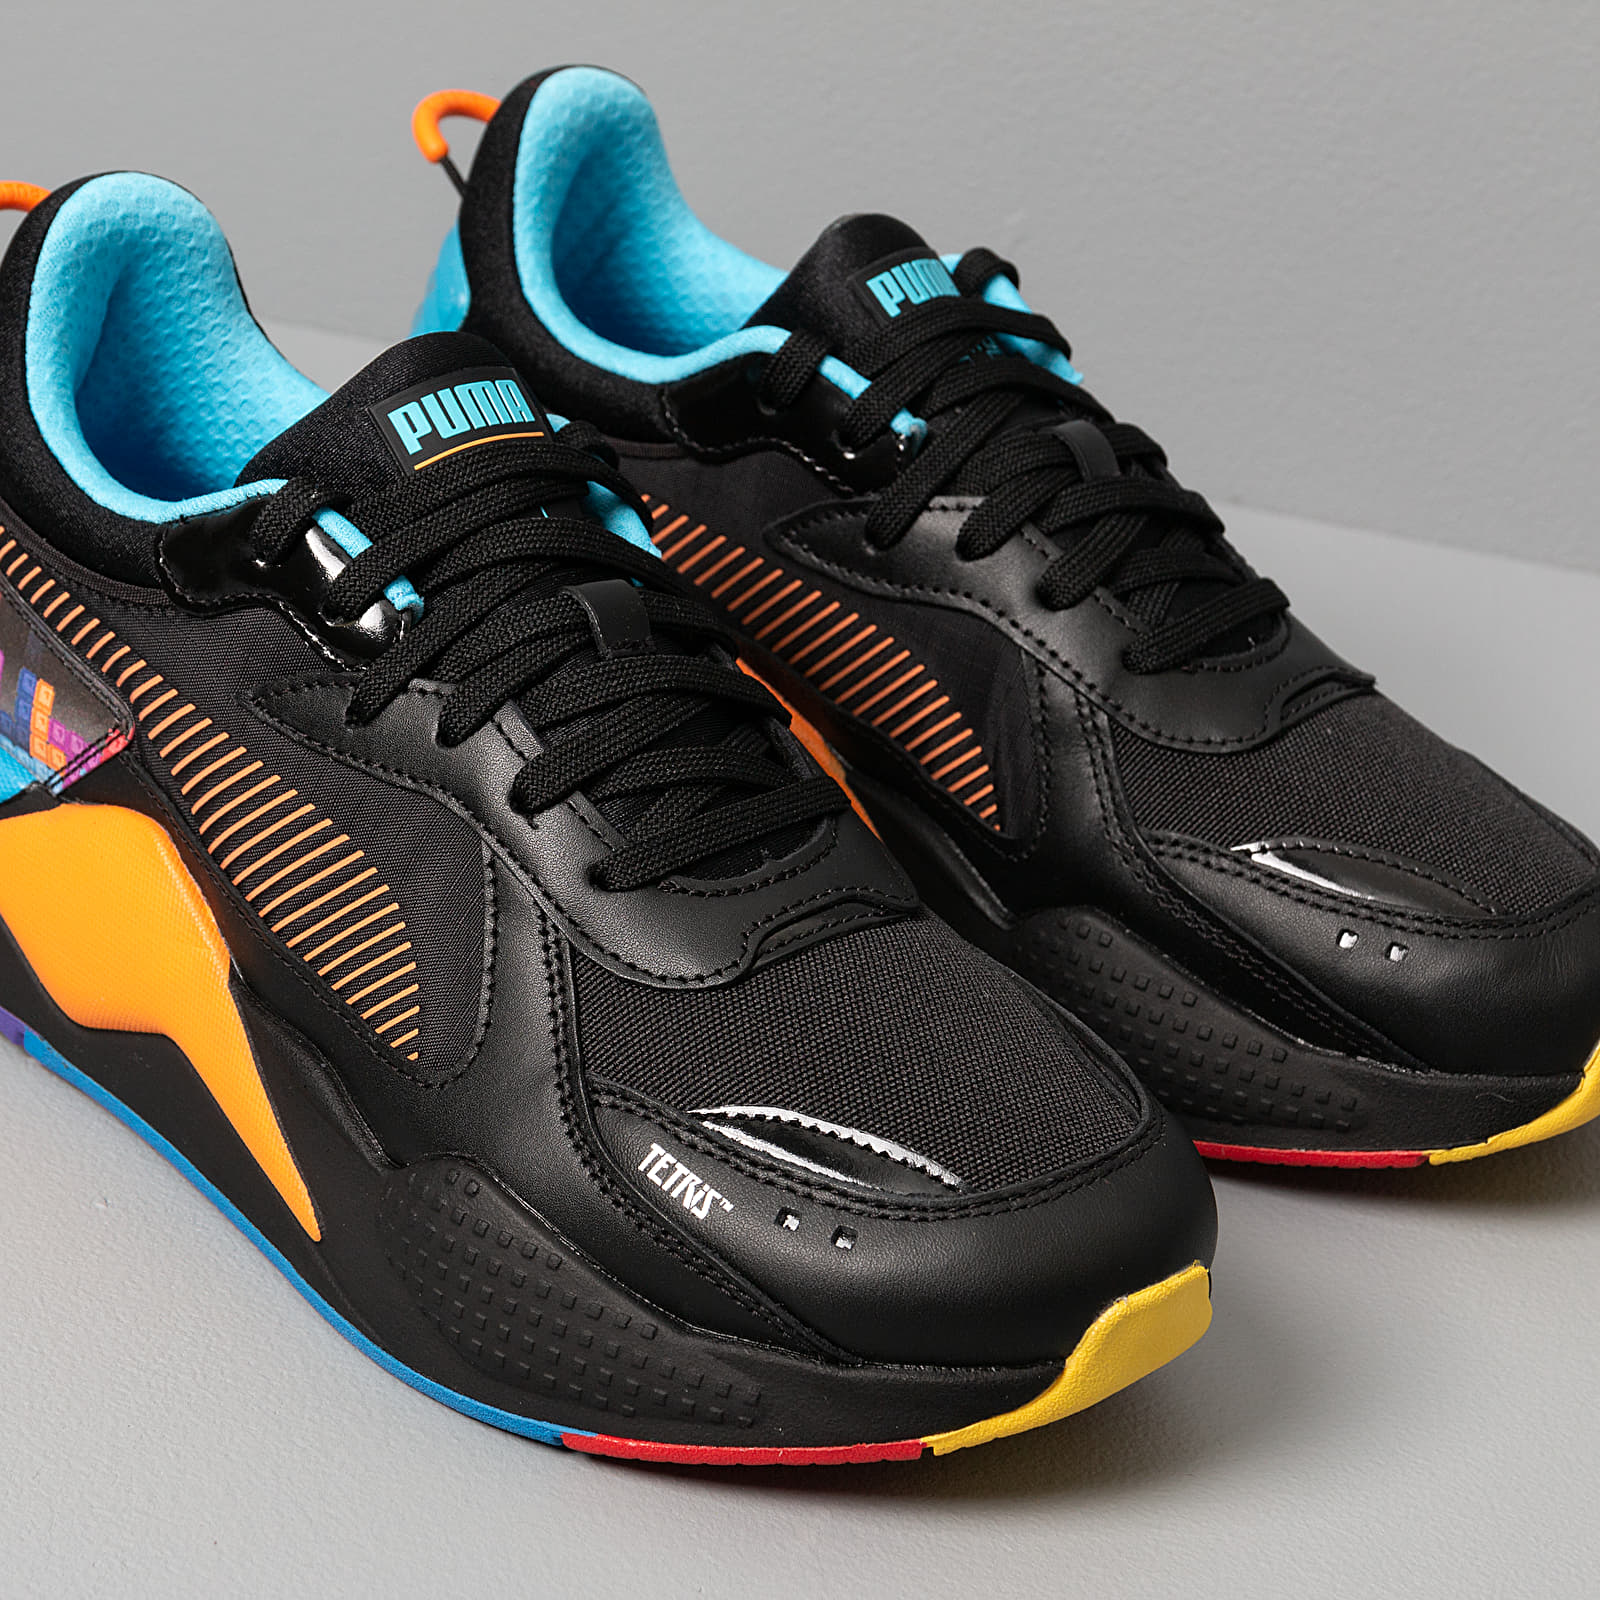 Puma x Tetris RS X Puma Black Luminous Blue | Footshop